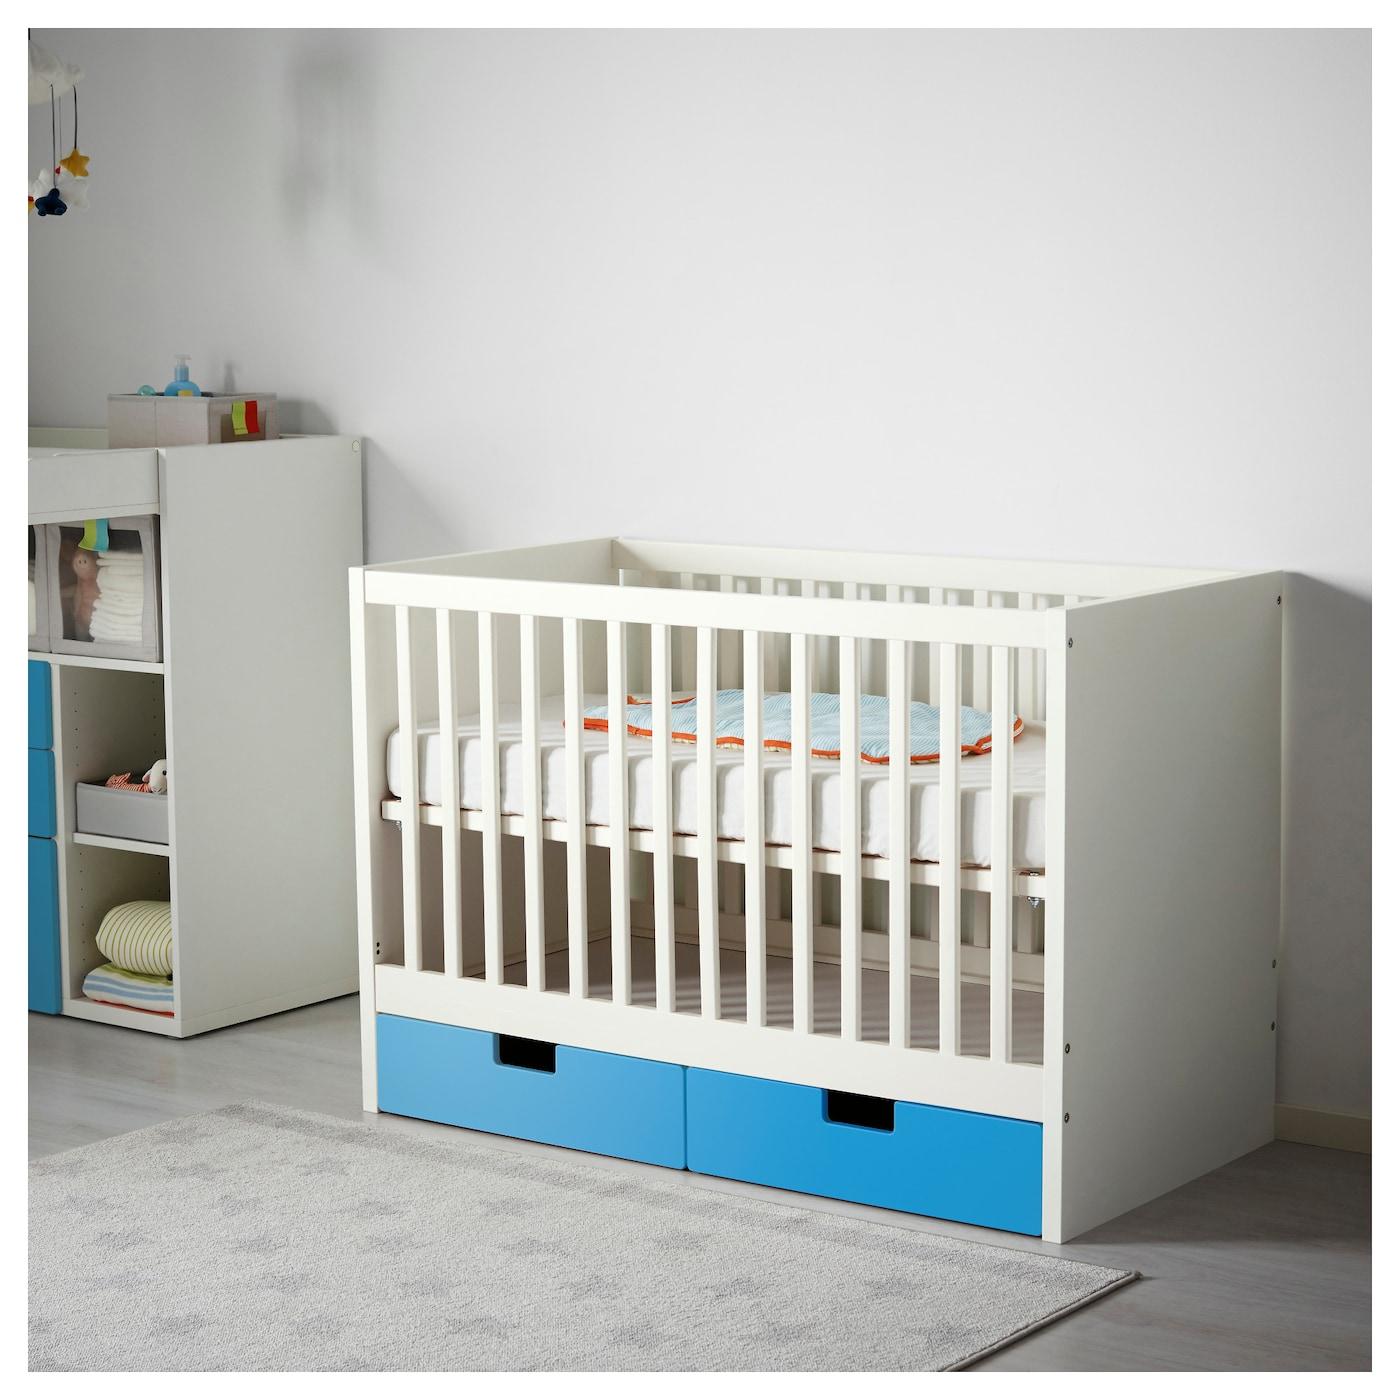 stuva lit enfant tiroirs bleu 60x120 cm ikea. Black Bedroom Furniture Sets. Home Design Ideas